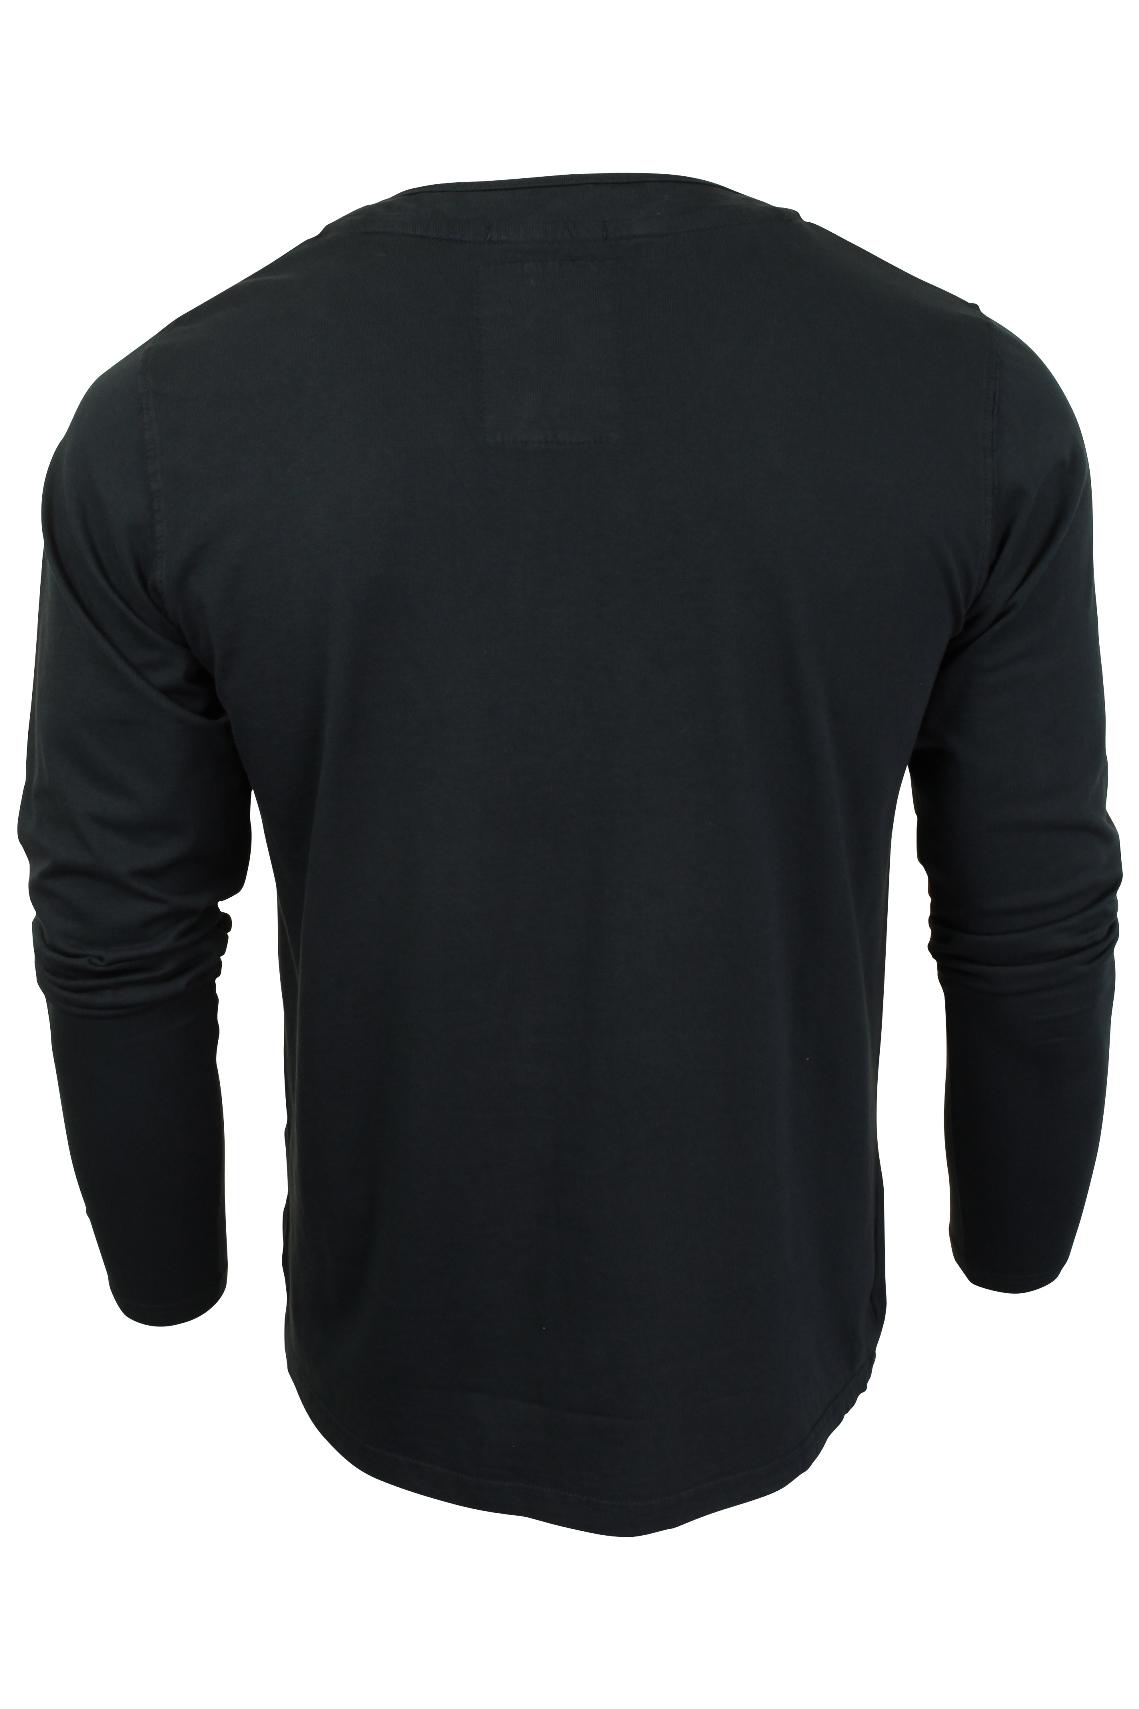 Mens-Grandad-T-Shirt-by-Tokyo-Laundry-039-Winter-Pines-039-Long-Sleeved thumbnail 5